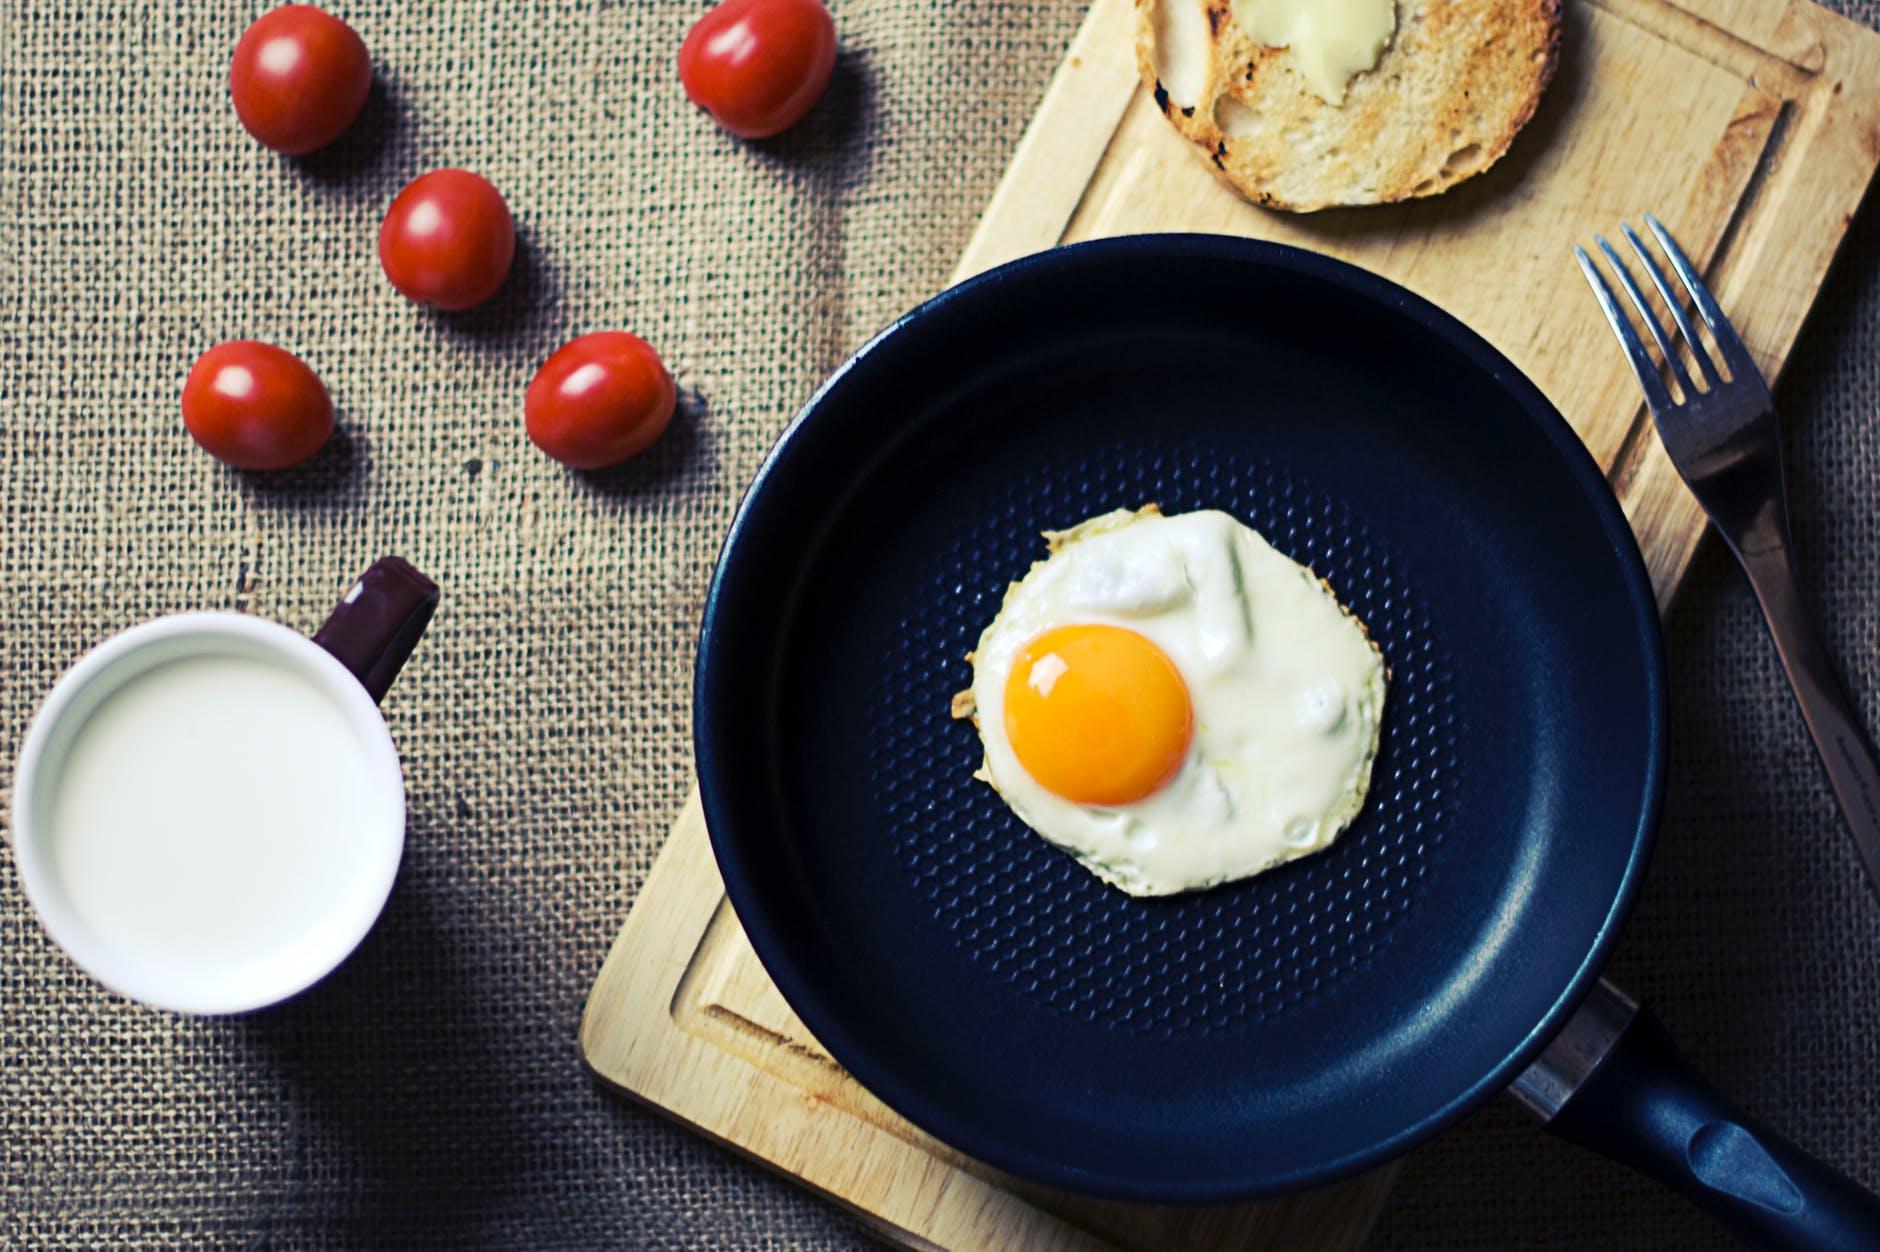 dorucak jaja mlijeko tost kruh protein